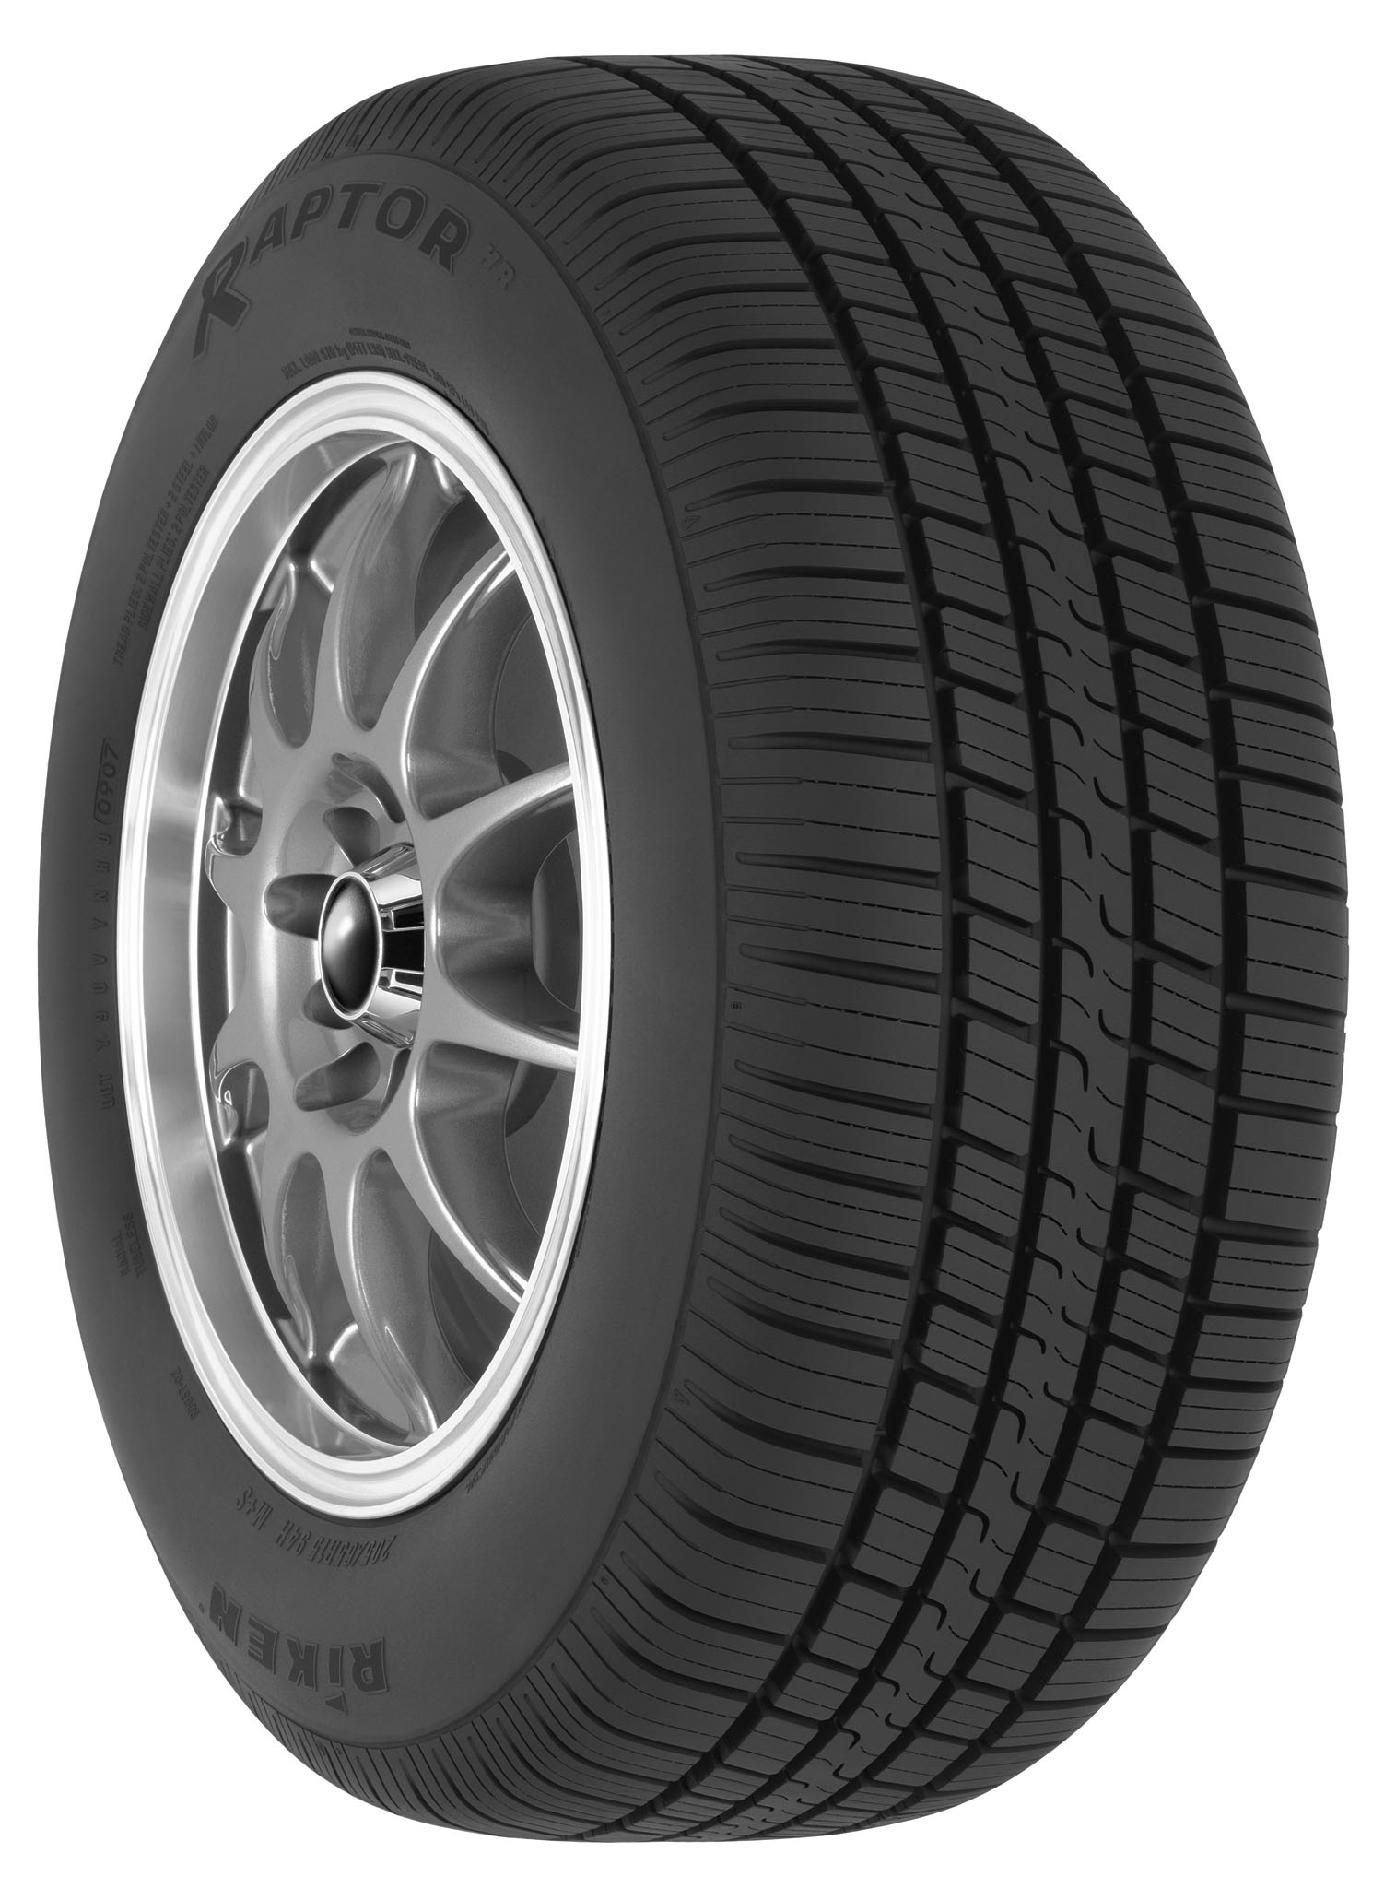 Riken Raptor - 205/65R15 94H BW - All Season Tire